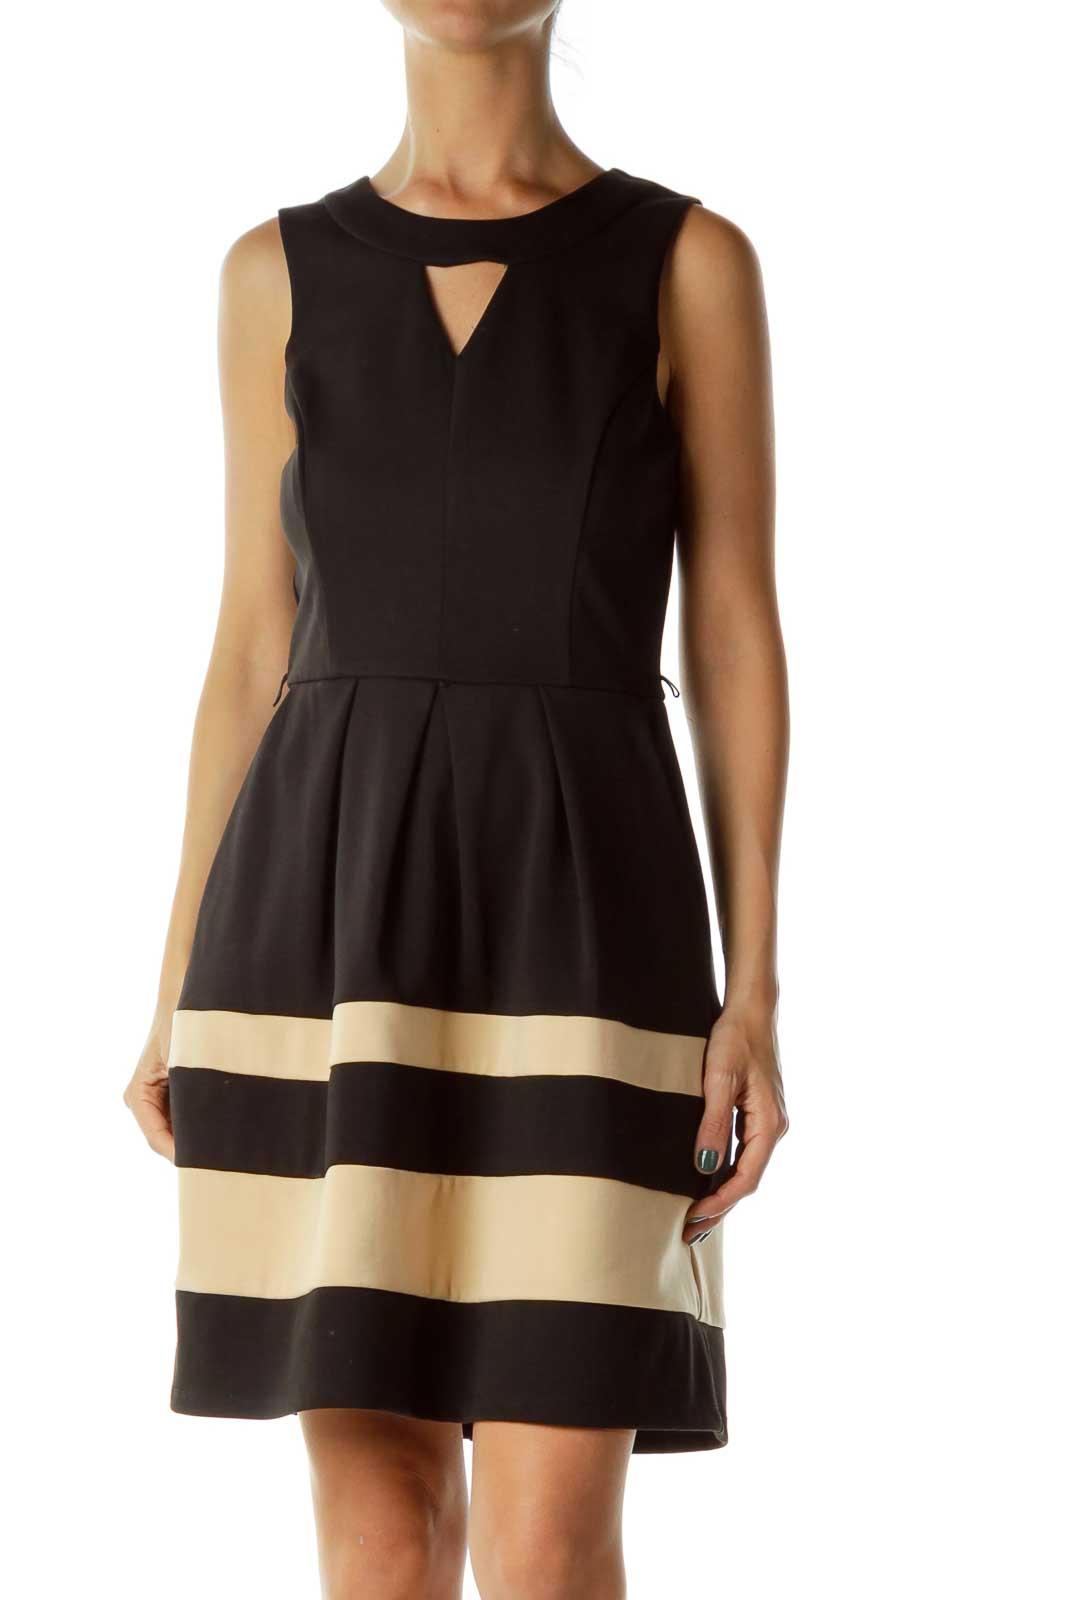 Black/Biege Sleeveless Dress Front